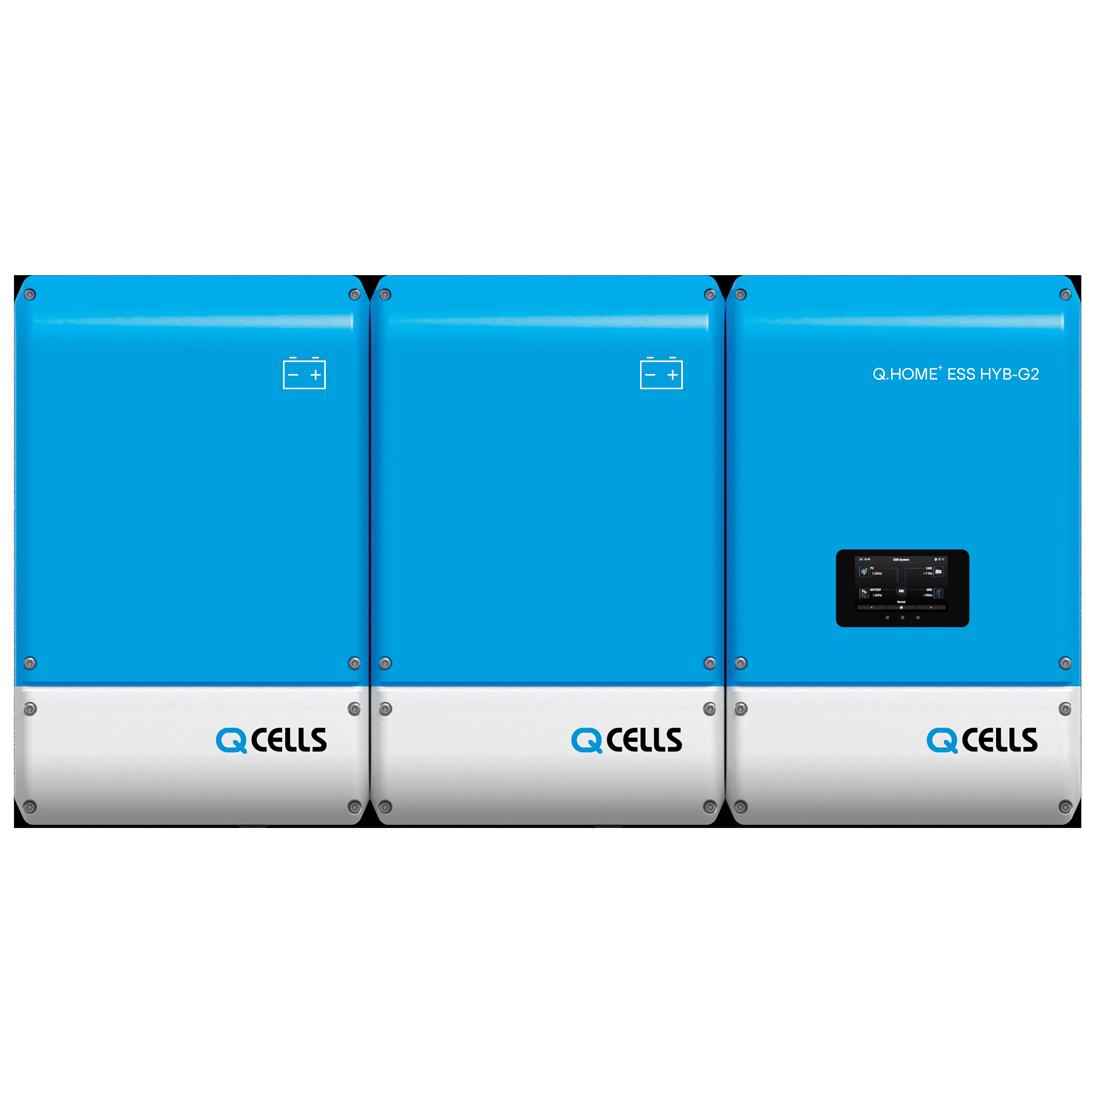 Hanwha Q CELLS battery image